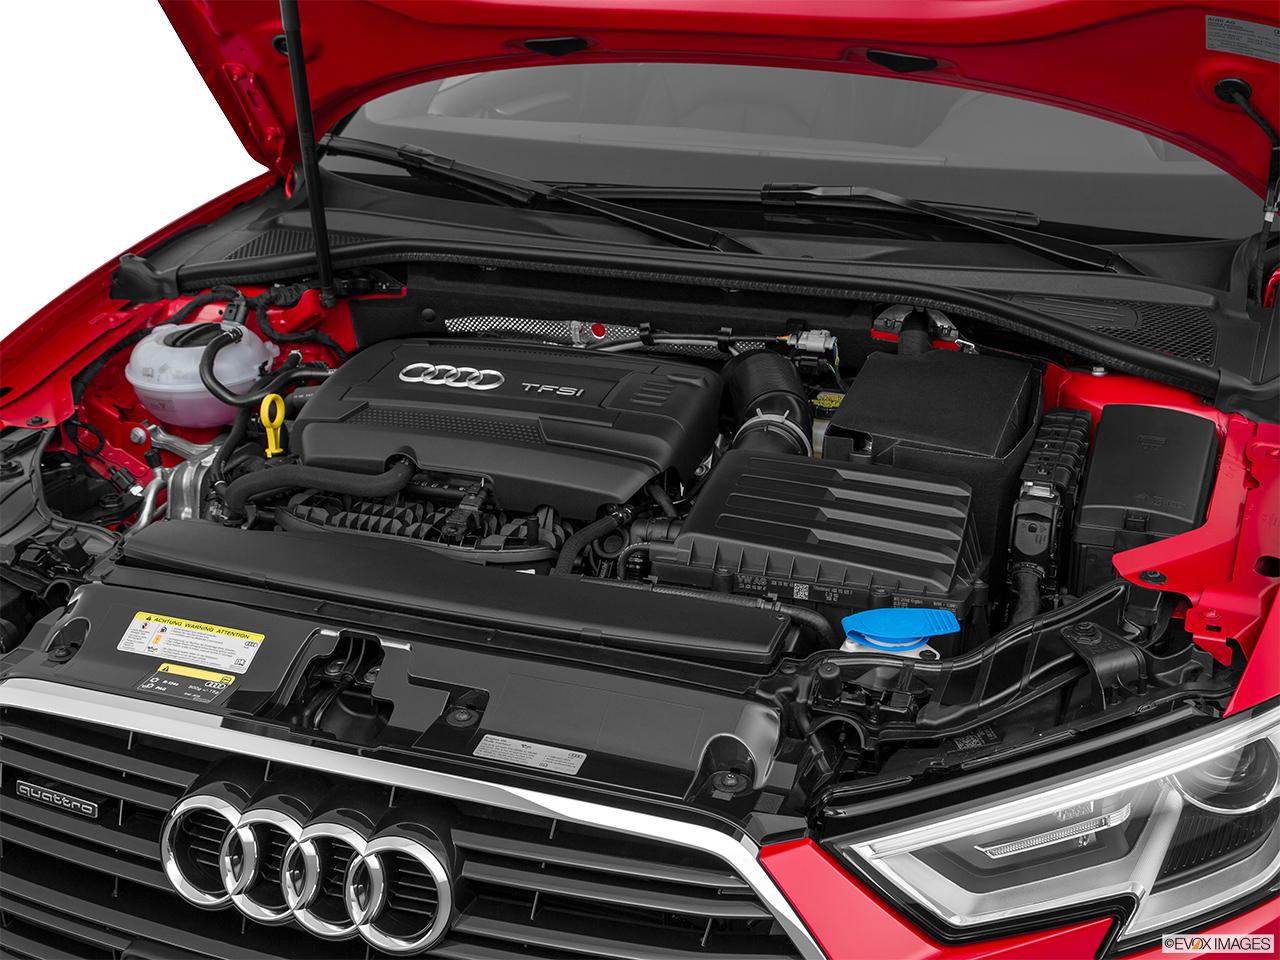 Audi A3 Sedan 2017 Design 40 2 0 Tfsi 190 Hp In Qatar New Car Prices Specs Reviews Amp Photos